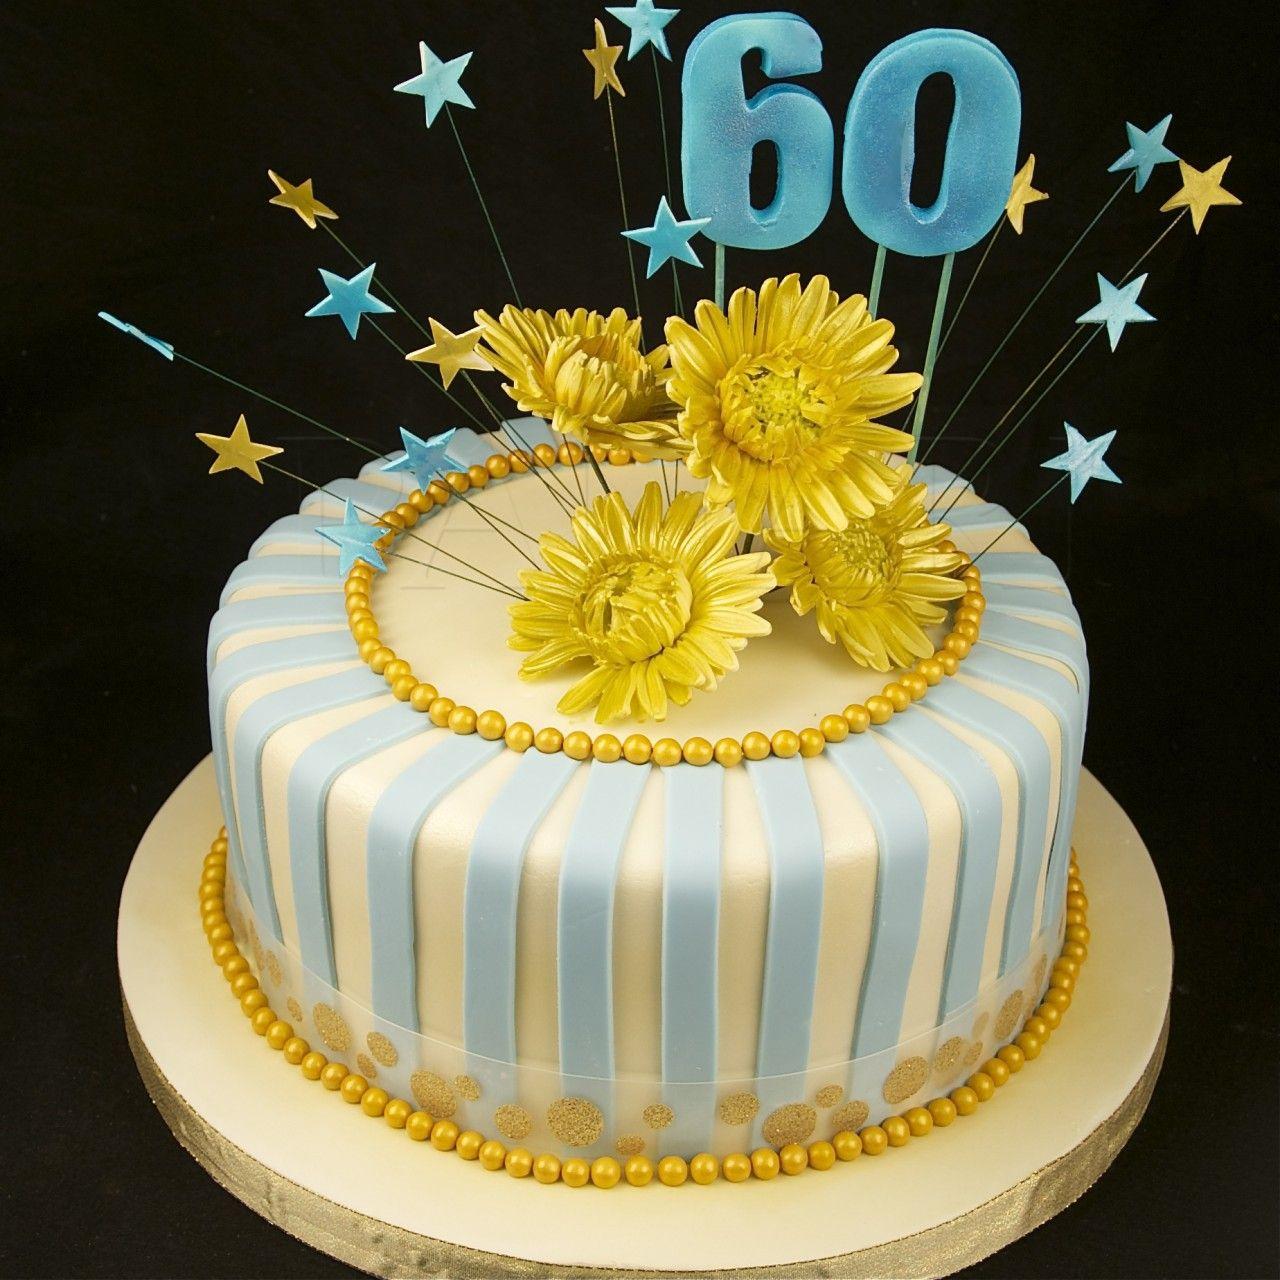 Ask Com Brunch Ideas 60th Birthday Cakes Birthday